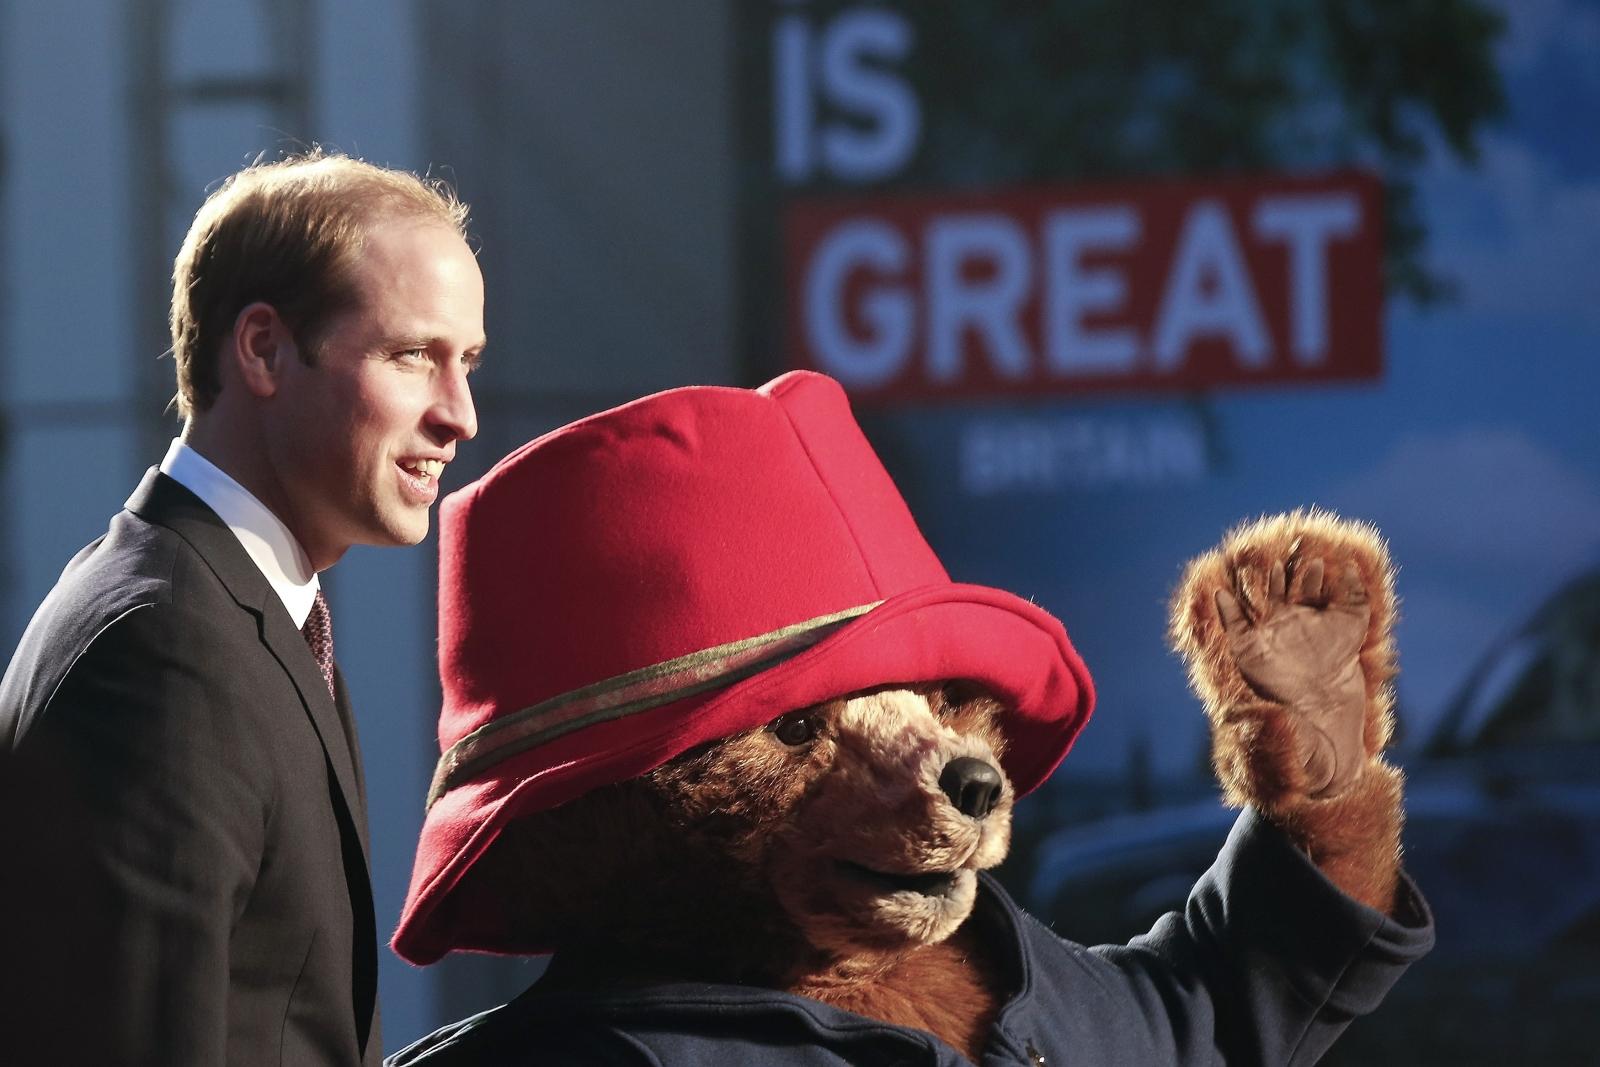 Prince William meets Paddington Bear